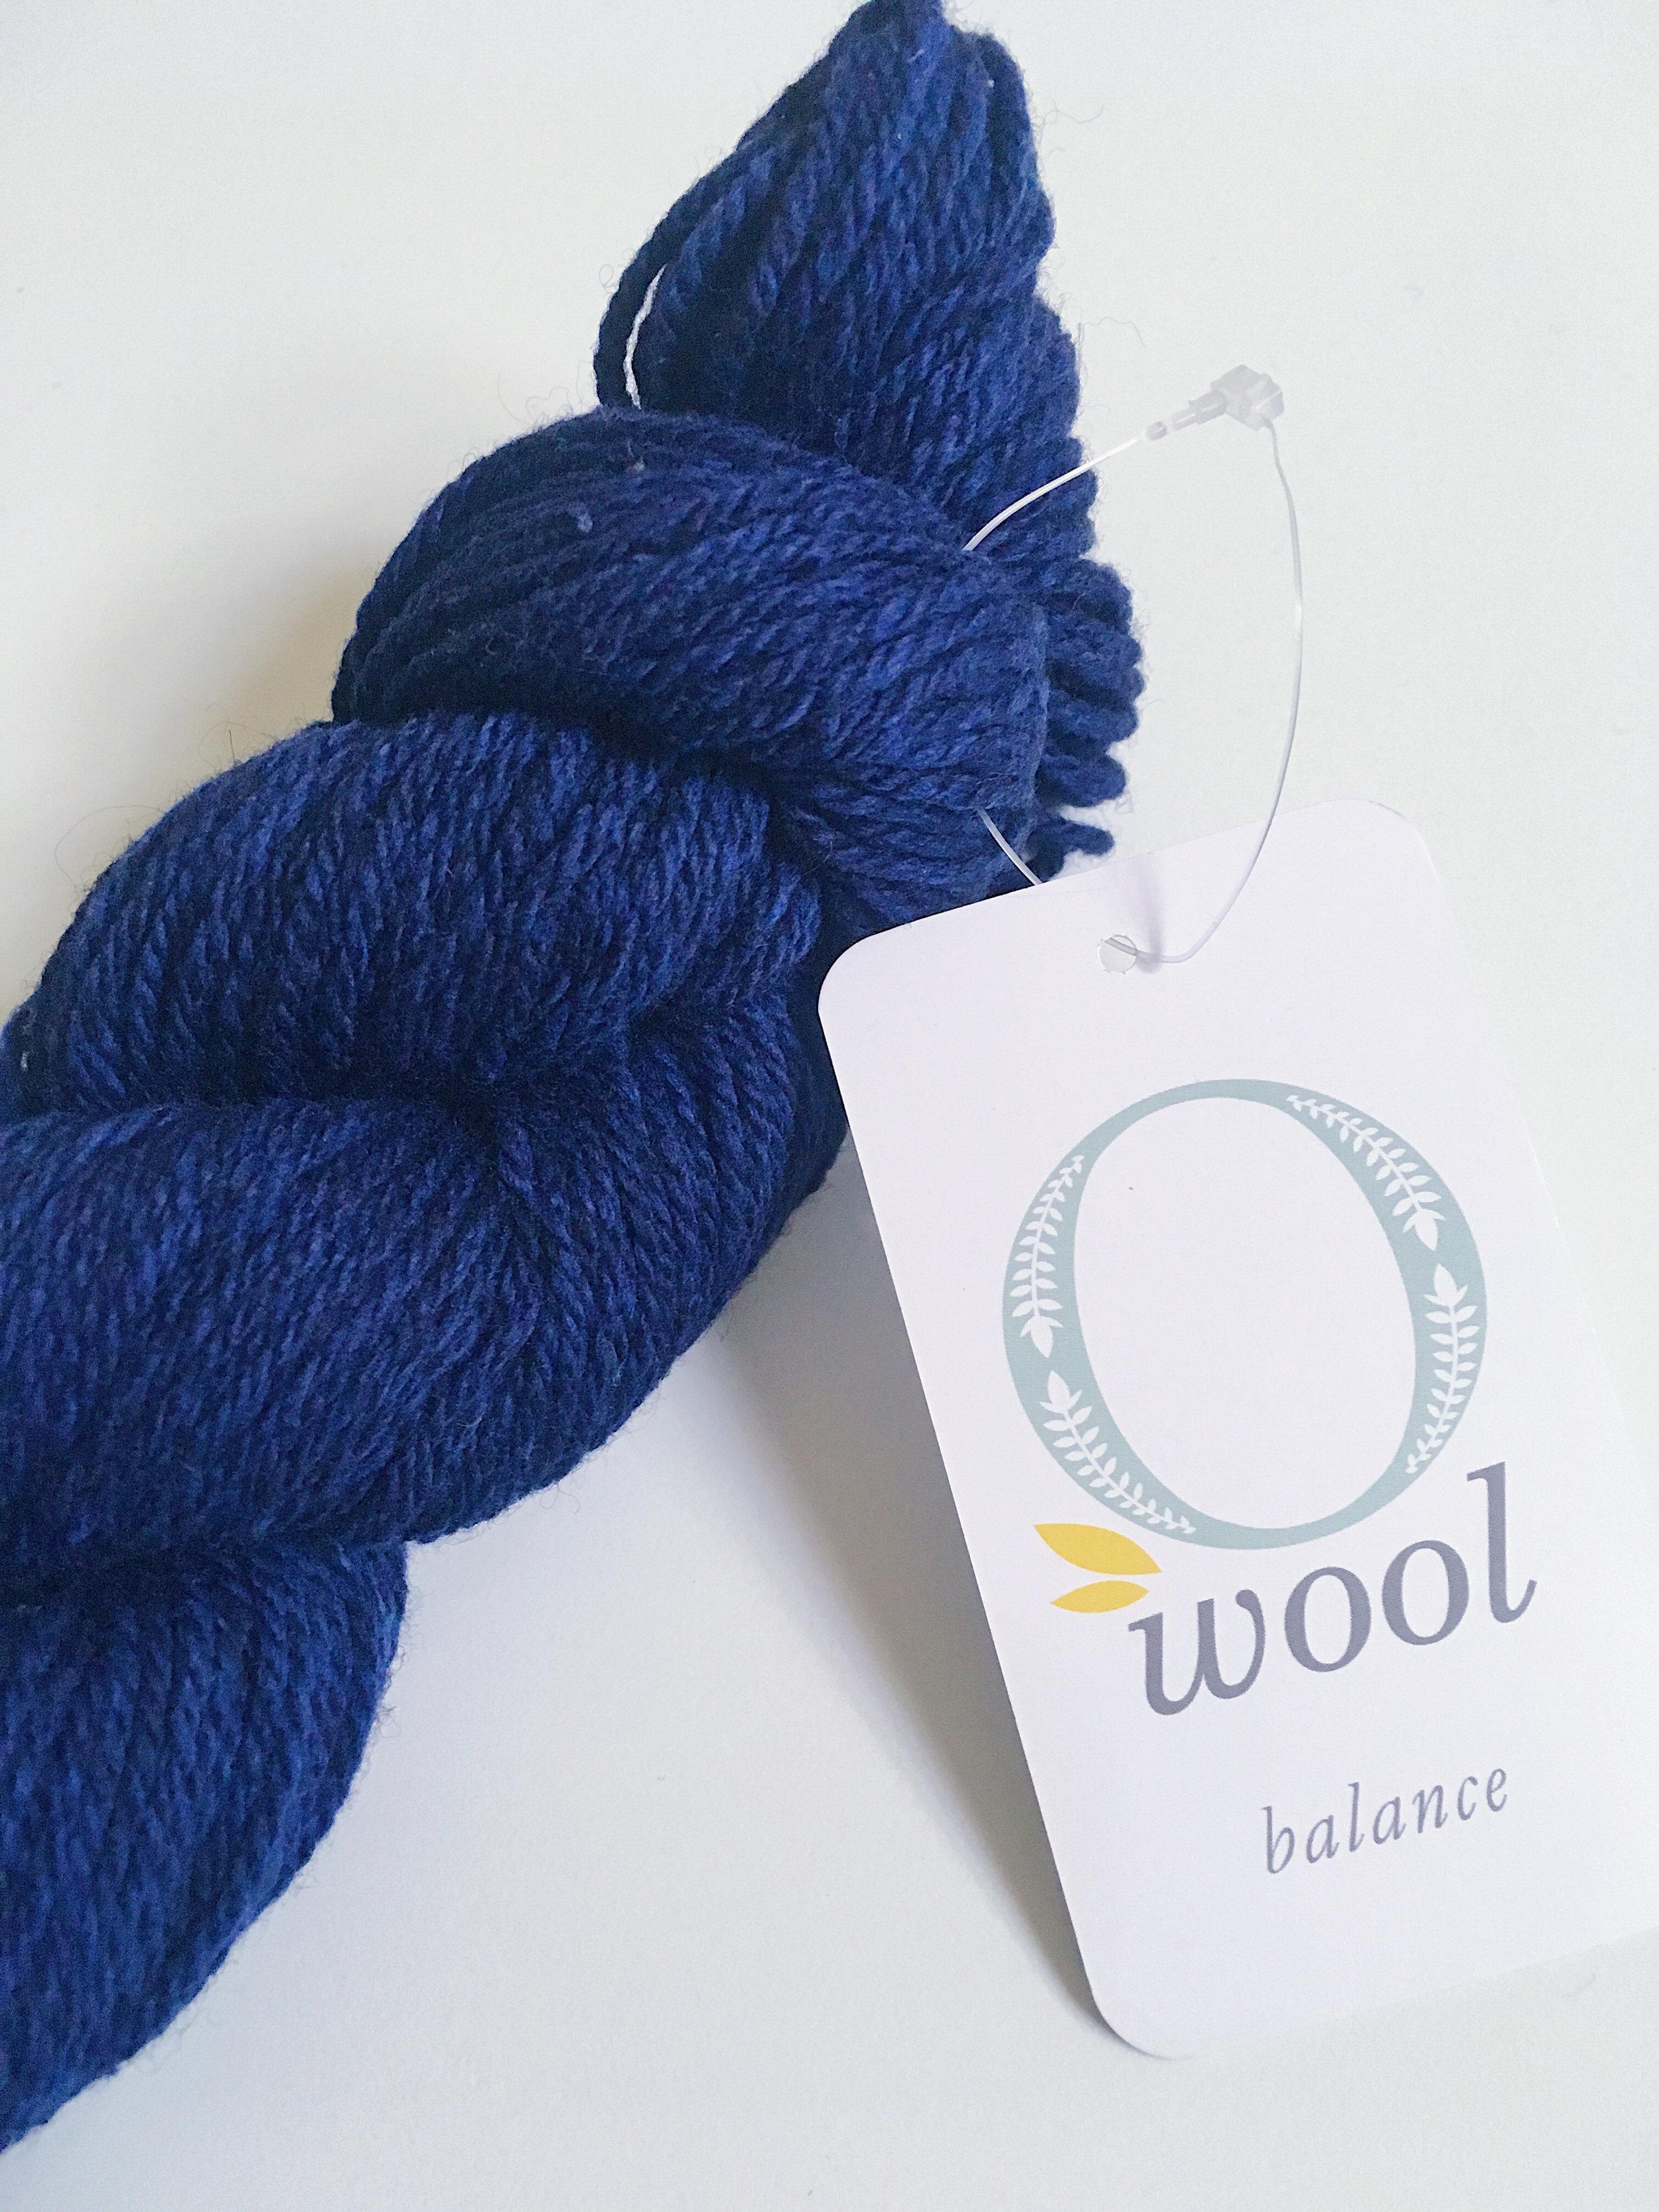 O-wool_balance_1.JPG